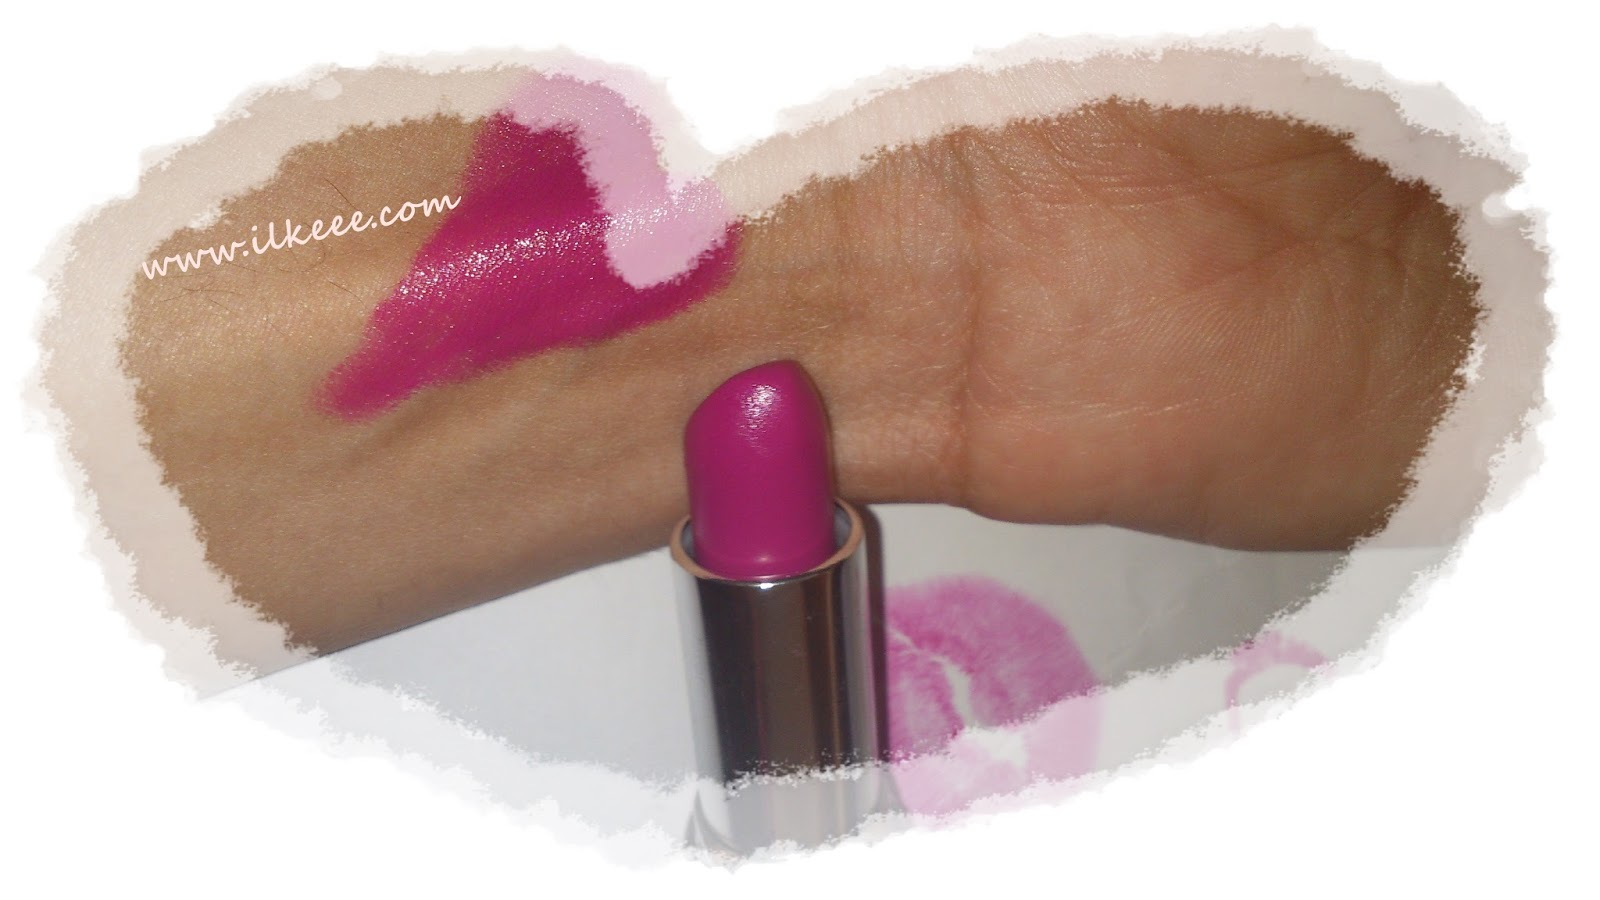 Avon - Avon Bold Ruj - Ultra Colour Bold Ruj - Hi-Def Plum - Bold Ruj Kullananlar - Mat ve Parlak Bitişli Ruj - Kremsi Ruj - Hi def plum swatch